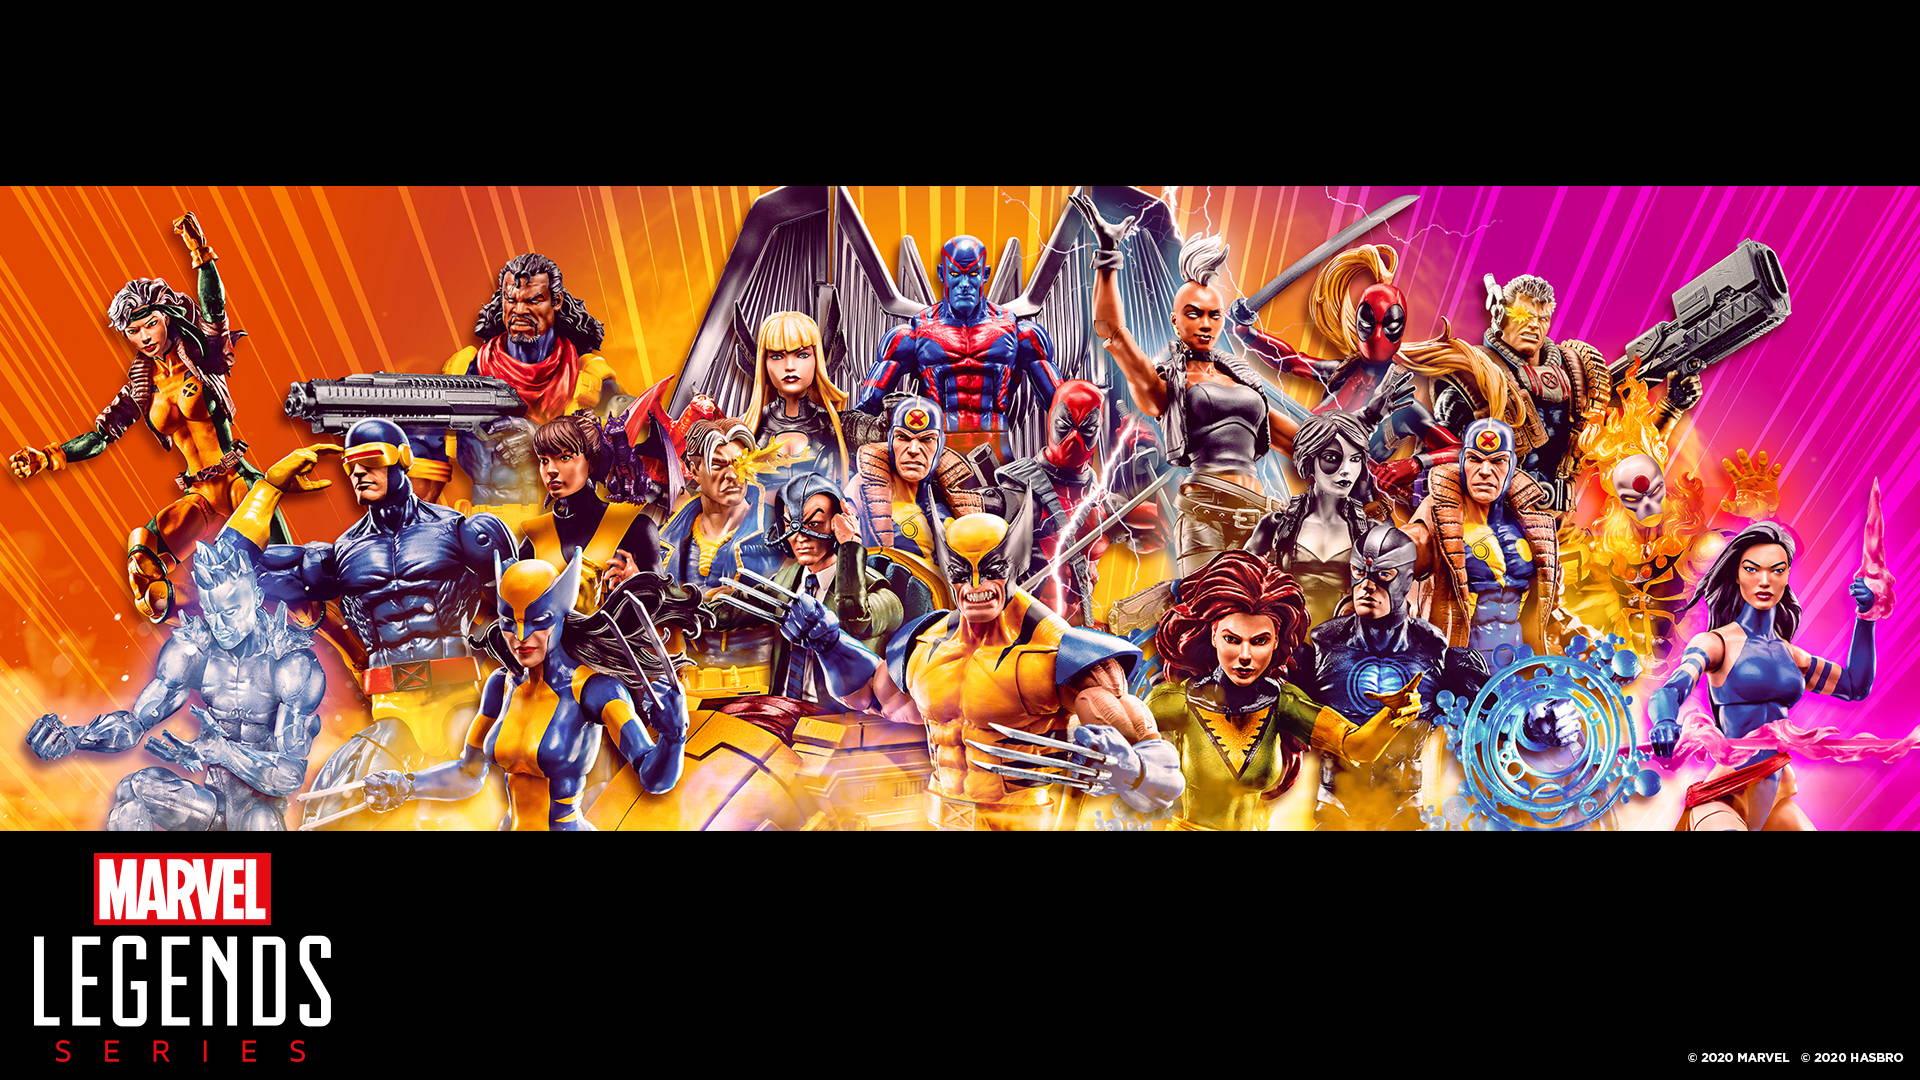 Marvel Legends Virtual Backgrounds Hasbro Pulse 1920x1080